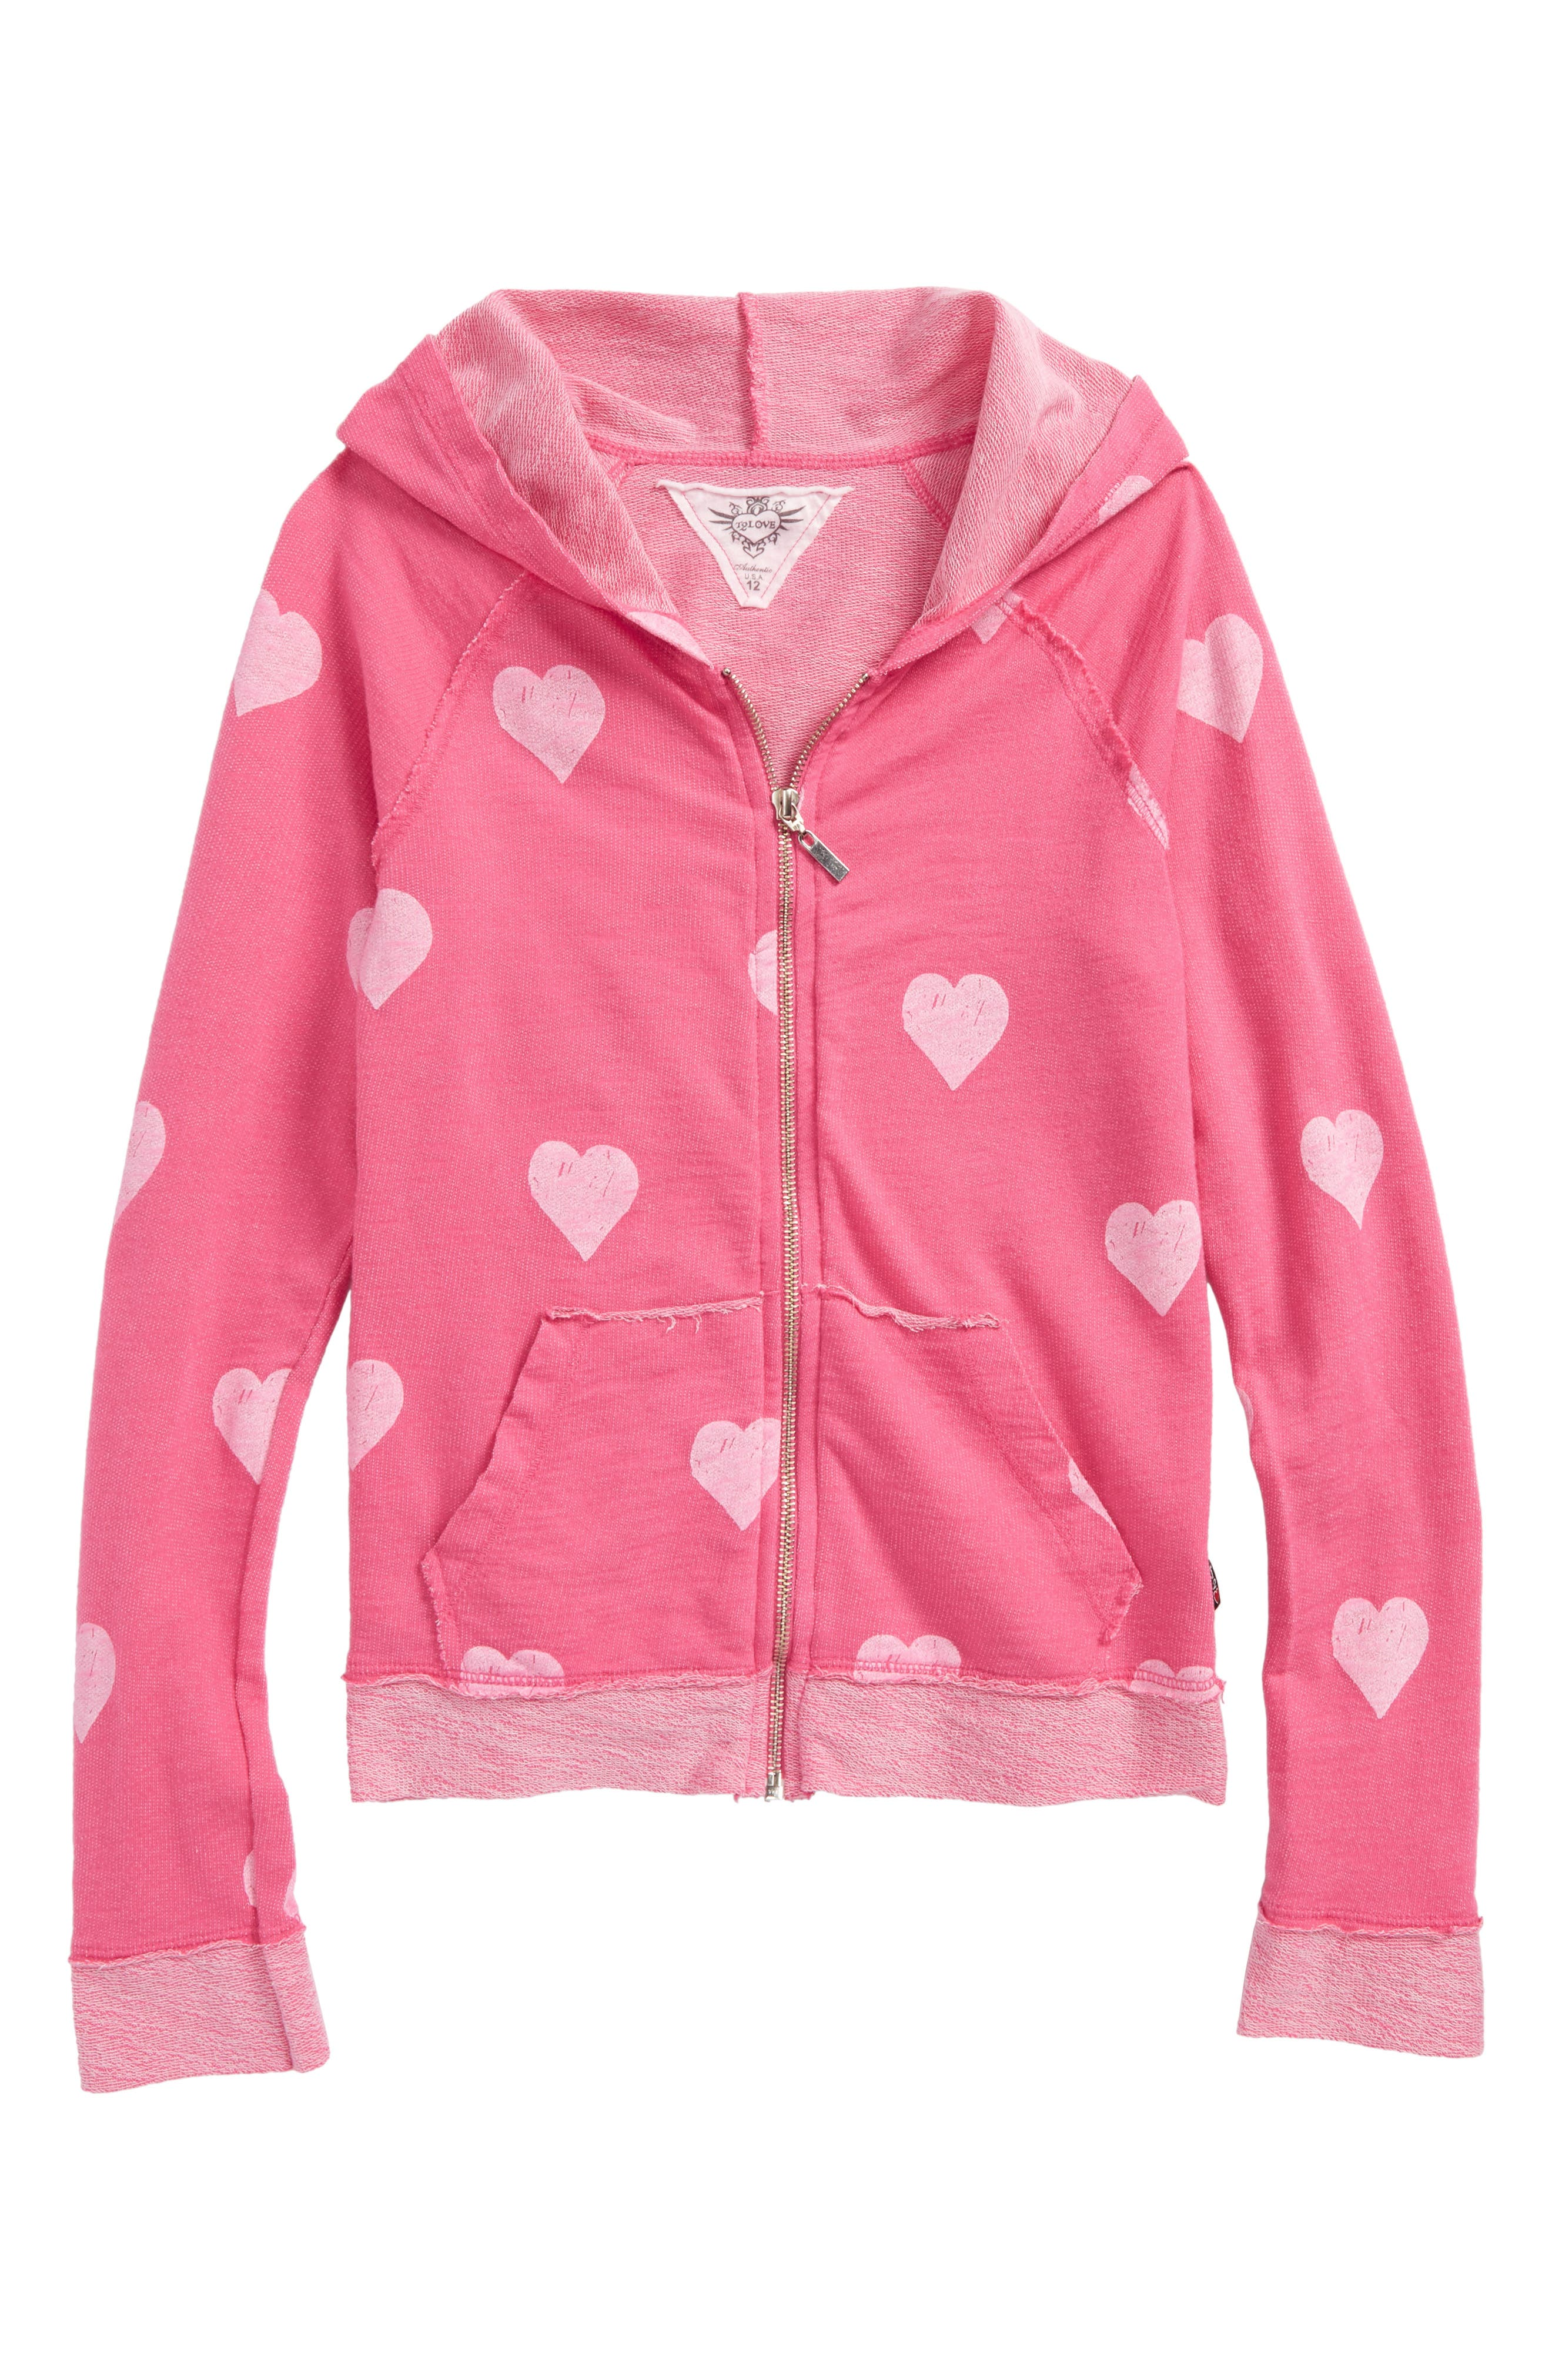 Alternate Image 1 Selected - T2 Love Allover Heart Zip Hoodie (Big Girls)